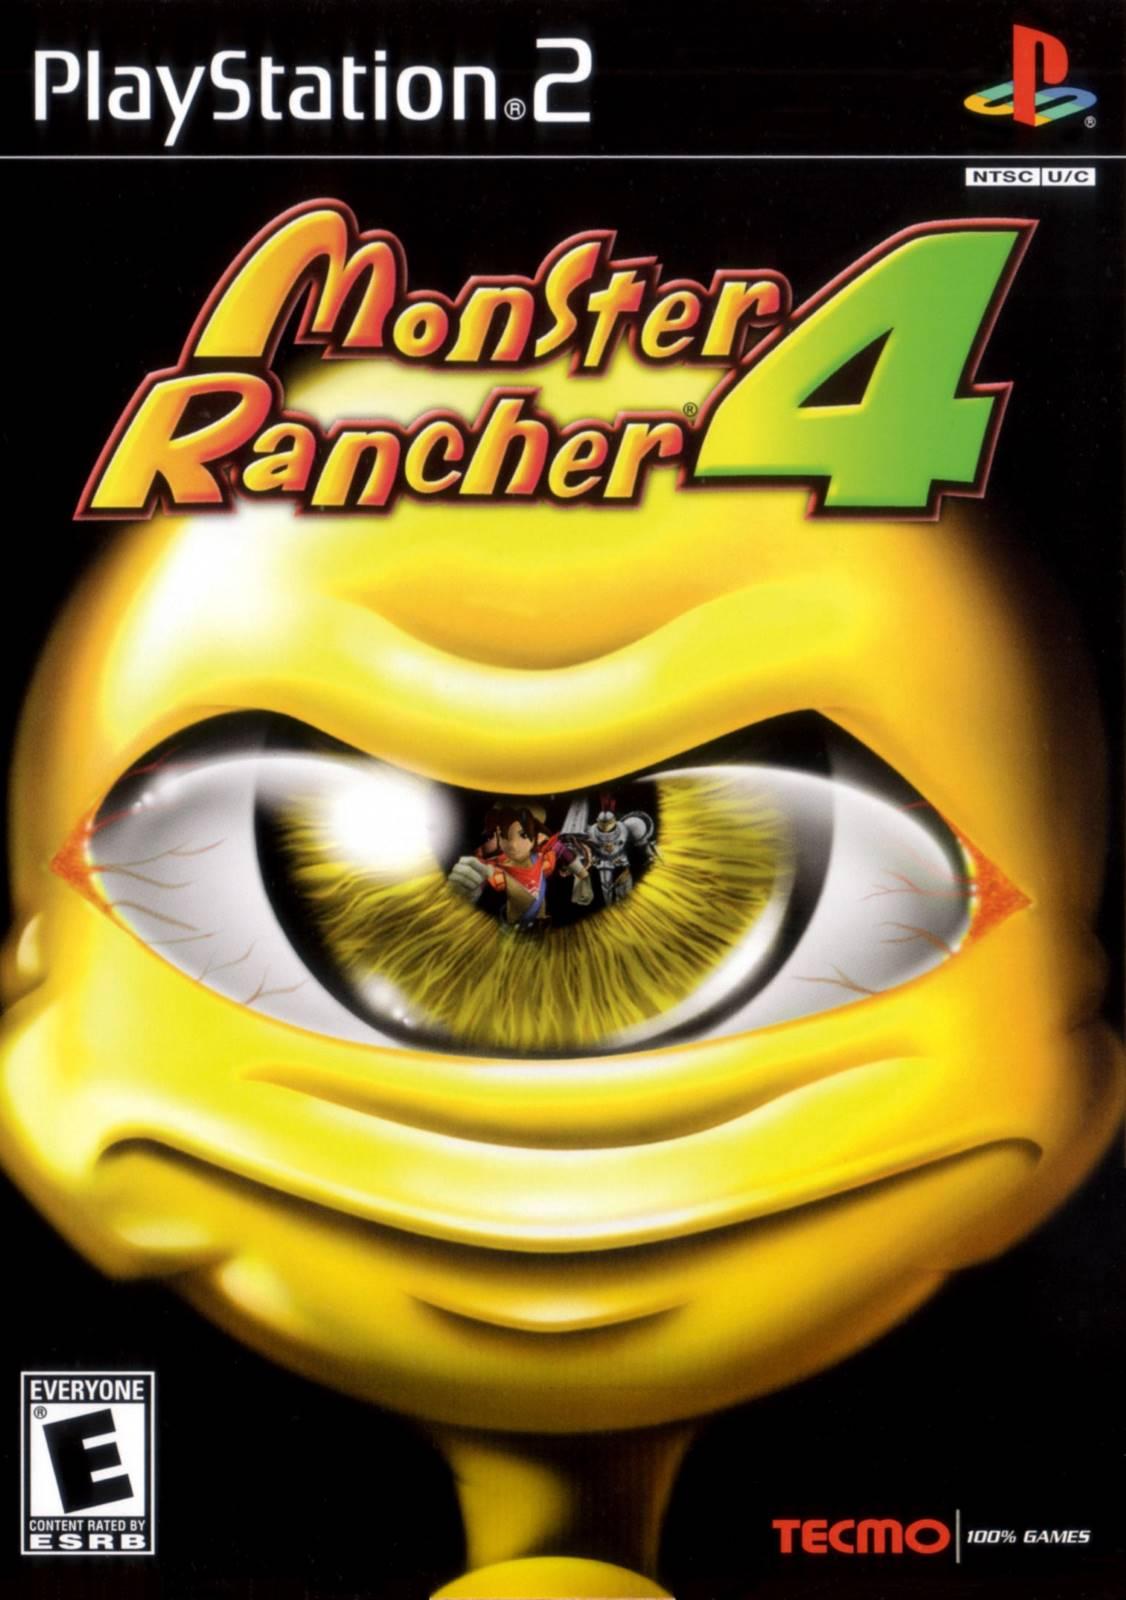 Monster rancher pron fucked photo